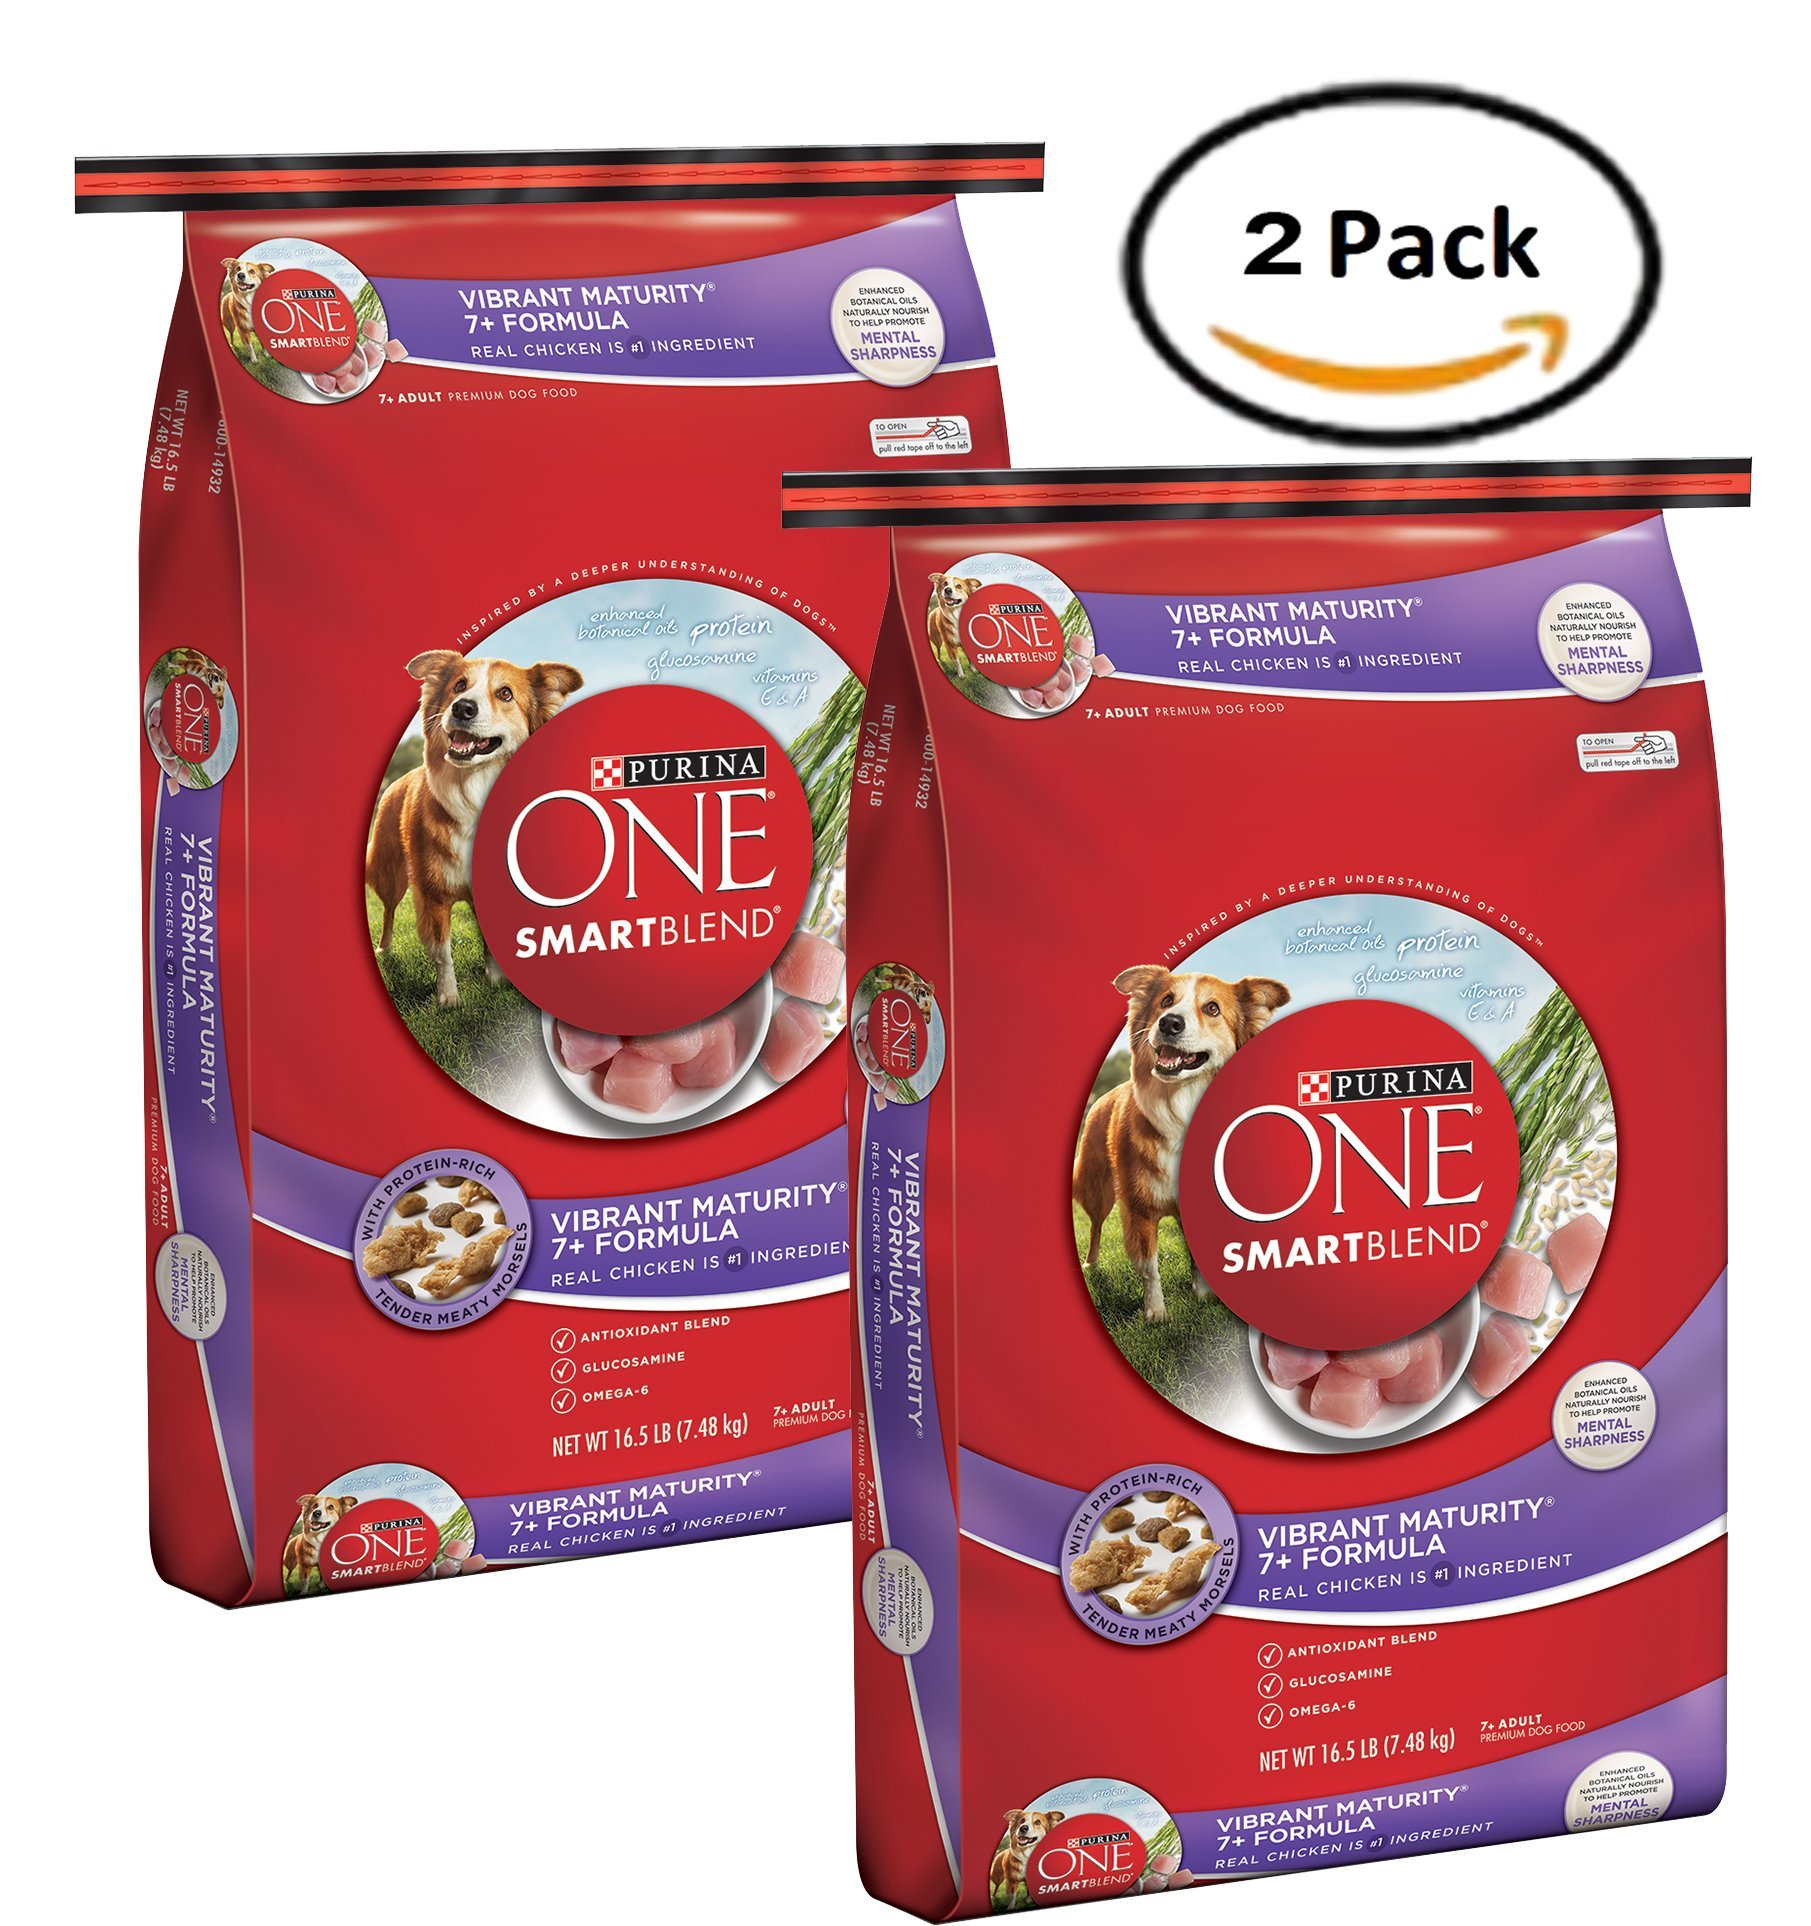 Pack of 2 - Purina ONE SmartBlend Vibrant Maturity 7+ Formula Adult Premium Dog Food 16.5 lb. Bag